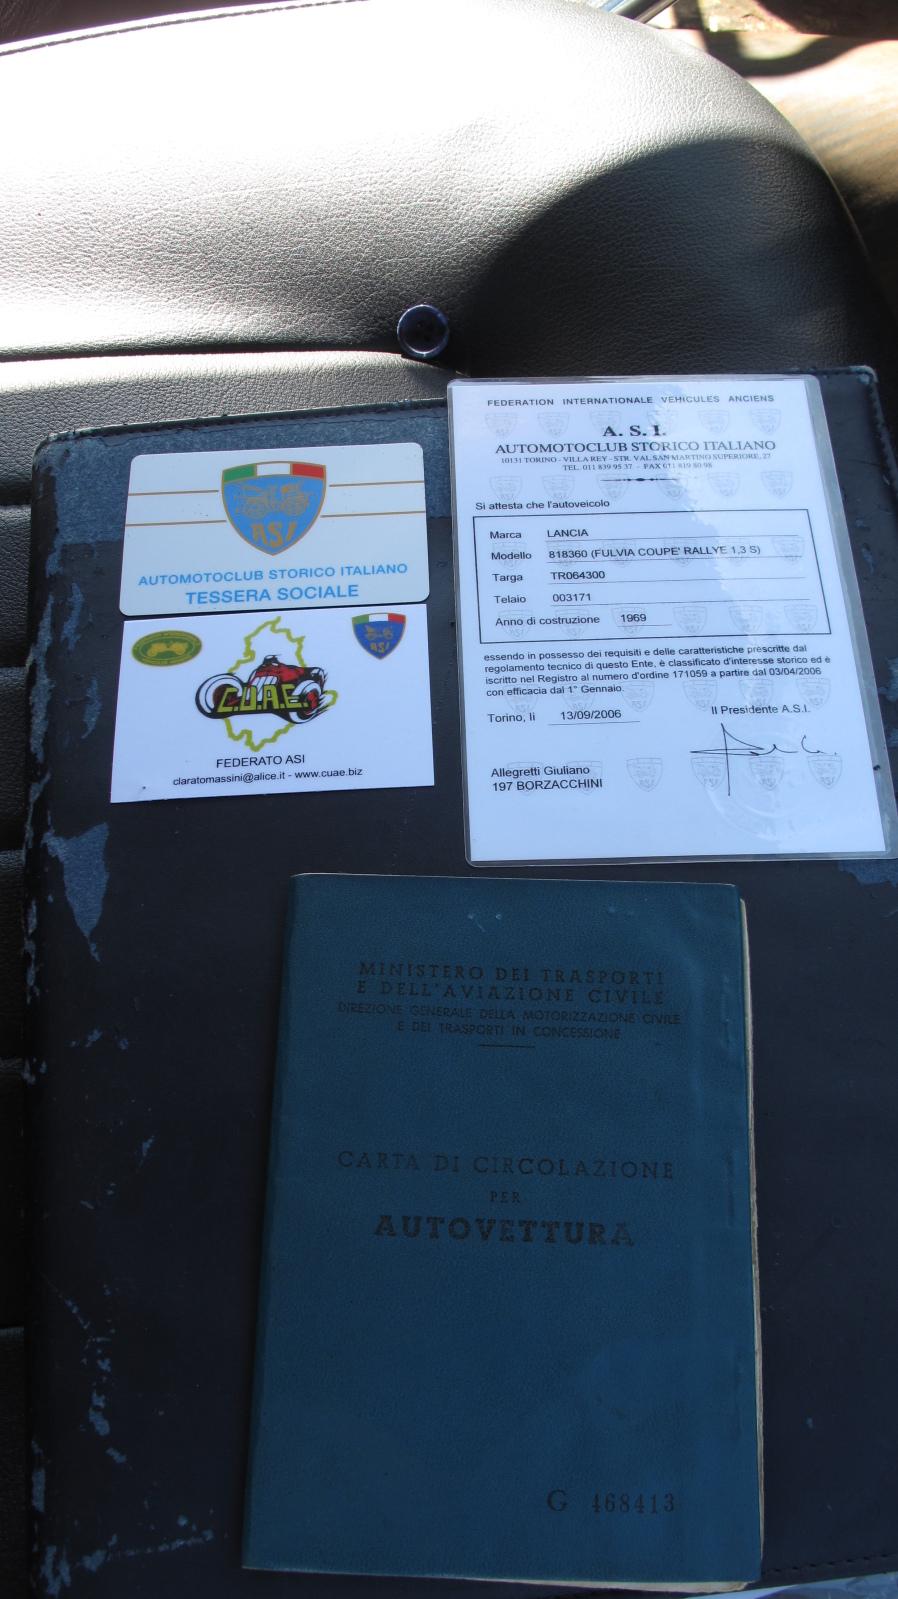 Fulvia 1.3S Rallye ==- Valutazione -== O8ugpk